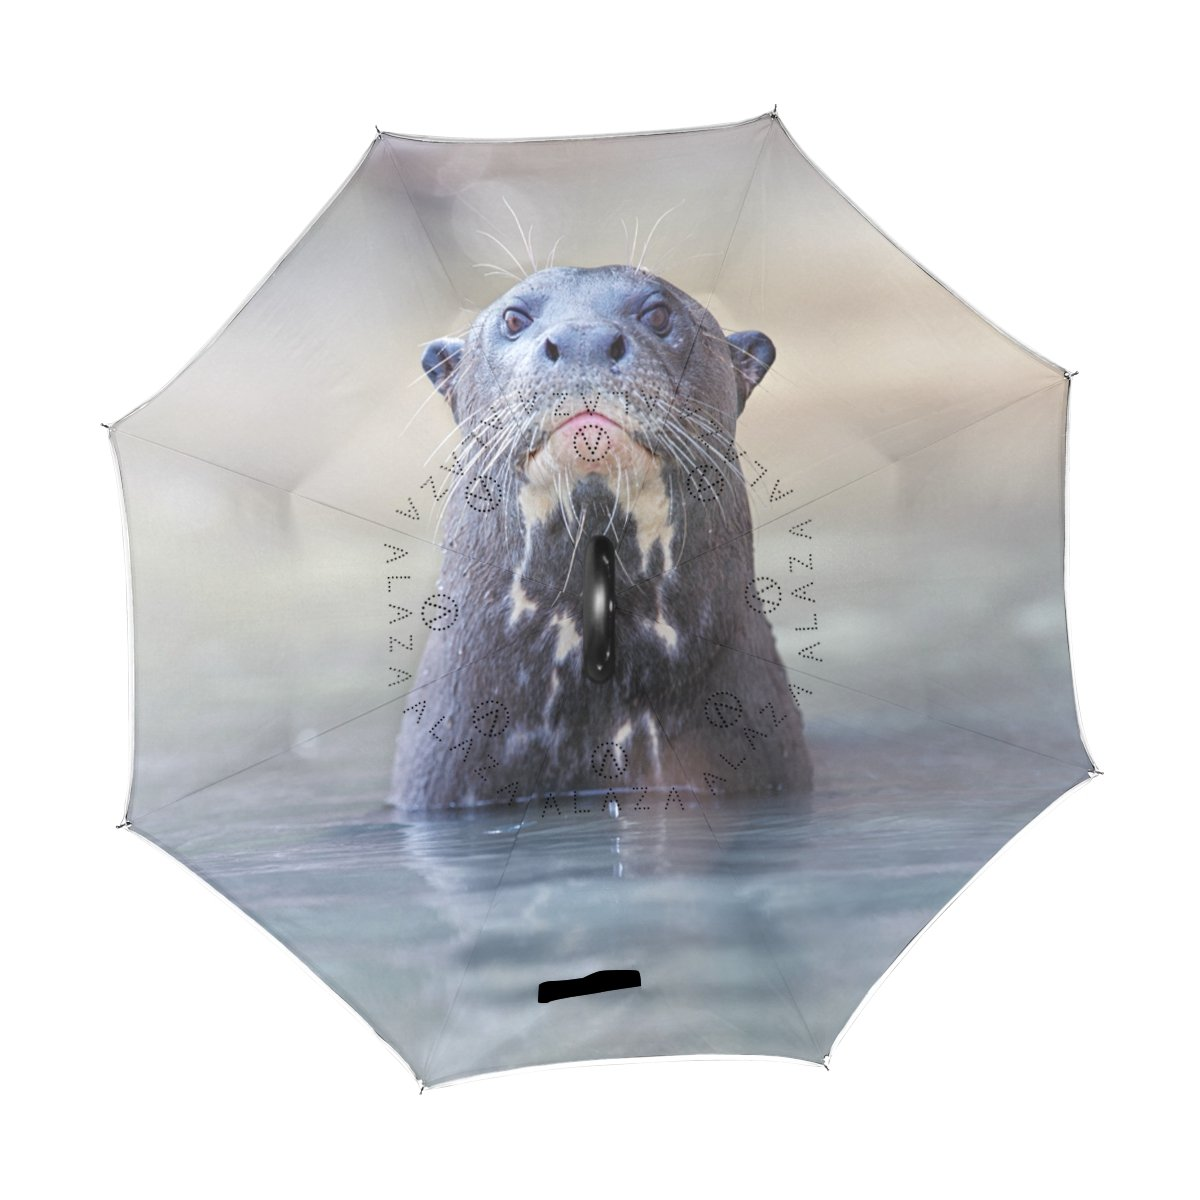 ALAZA Giant River Otter naturaleza fauna agua Animal puede paraguas paraguas plegable de doble capa resistente al viento Reverse para coche con mango de ...